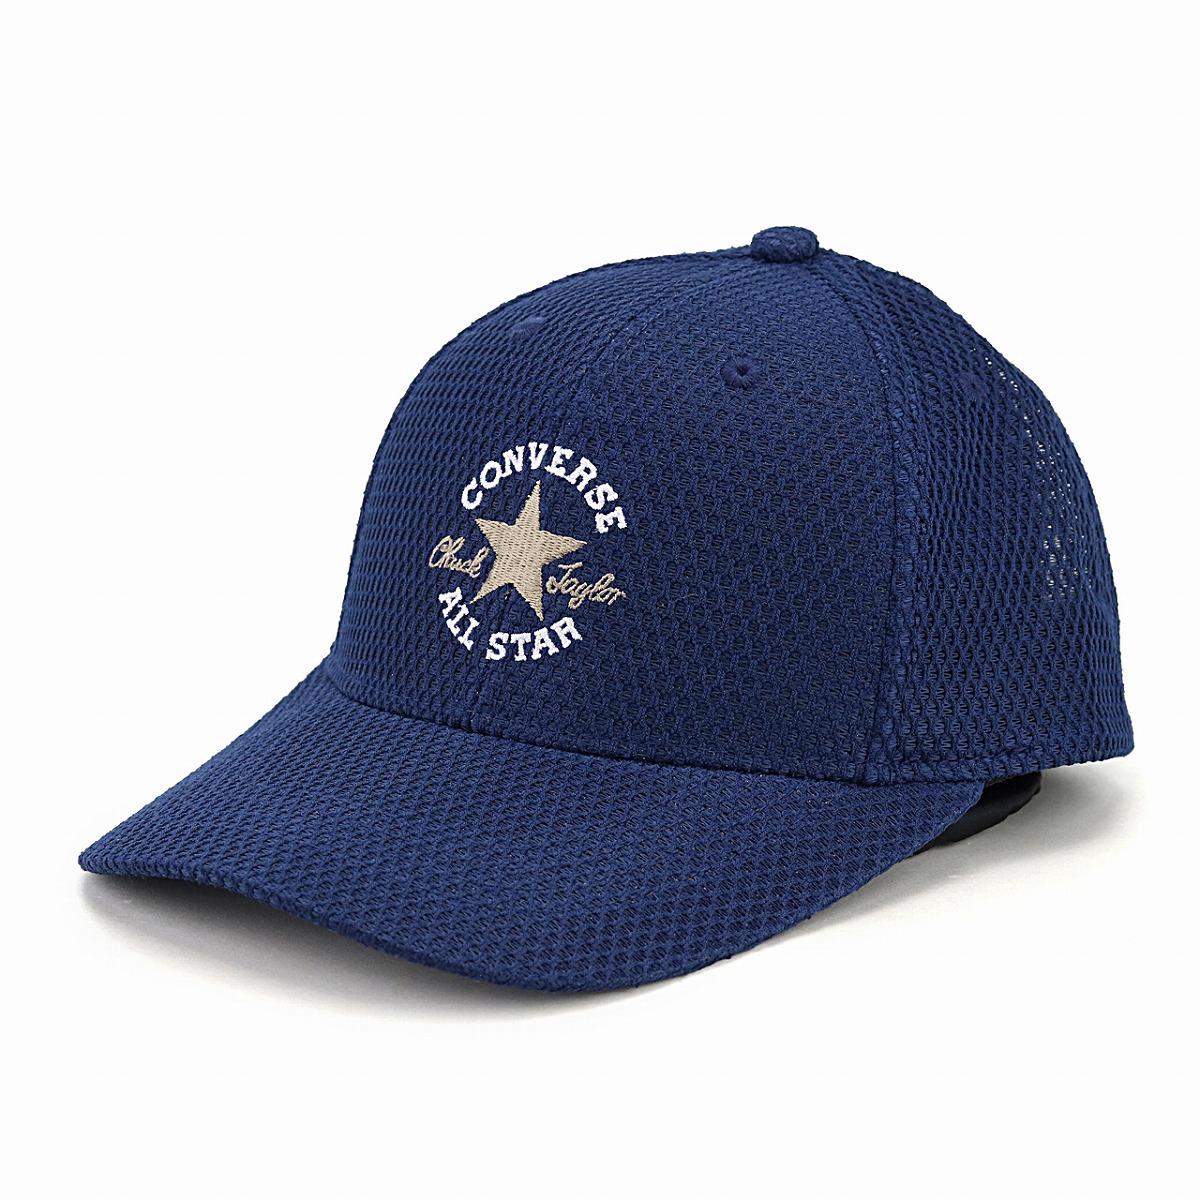 c05b205d9f024c ELEHELM HAT STORE: CONVERSE ALL STAR logo cap big size mesh cap sports cool  Converse all-stars moisture absorption fast-dry adjustable size hat size ...